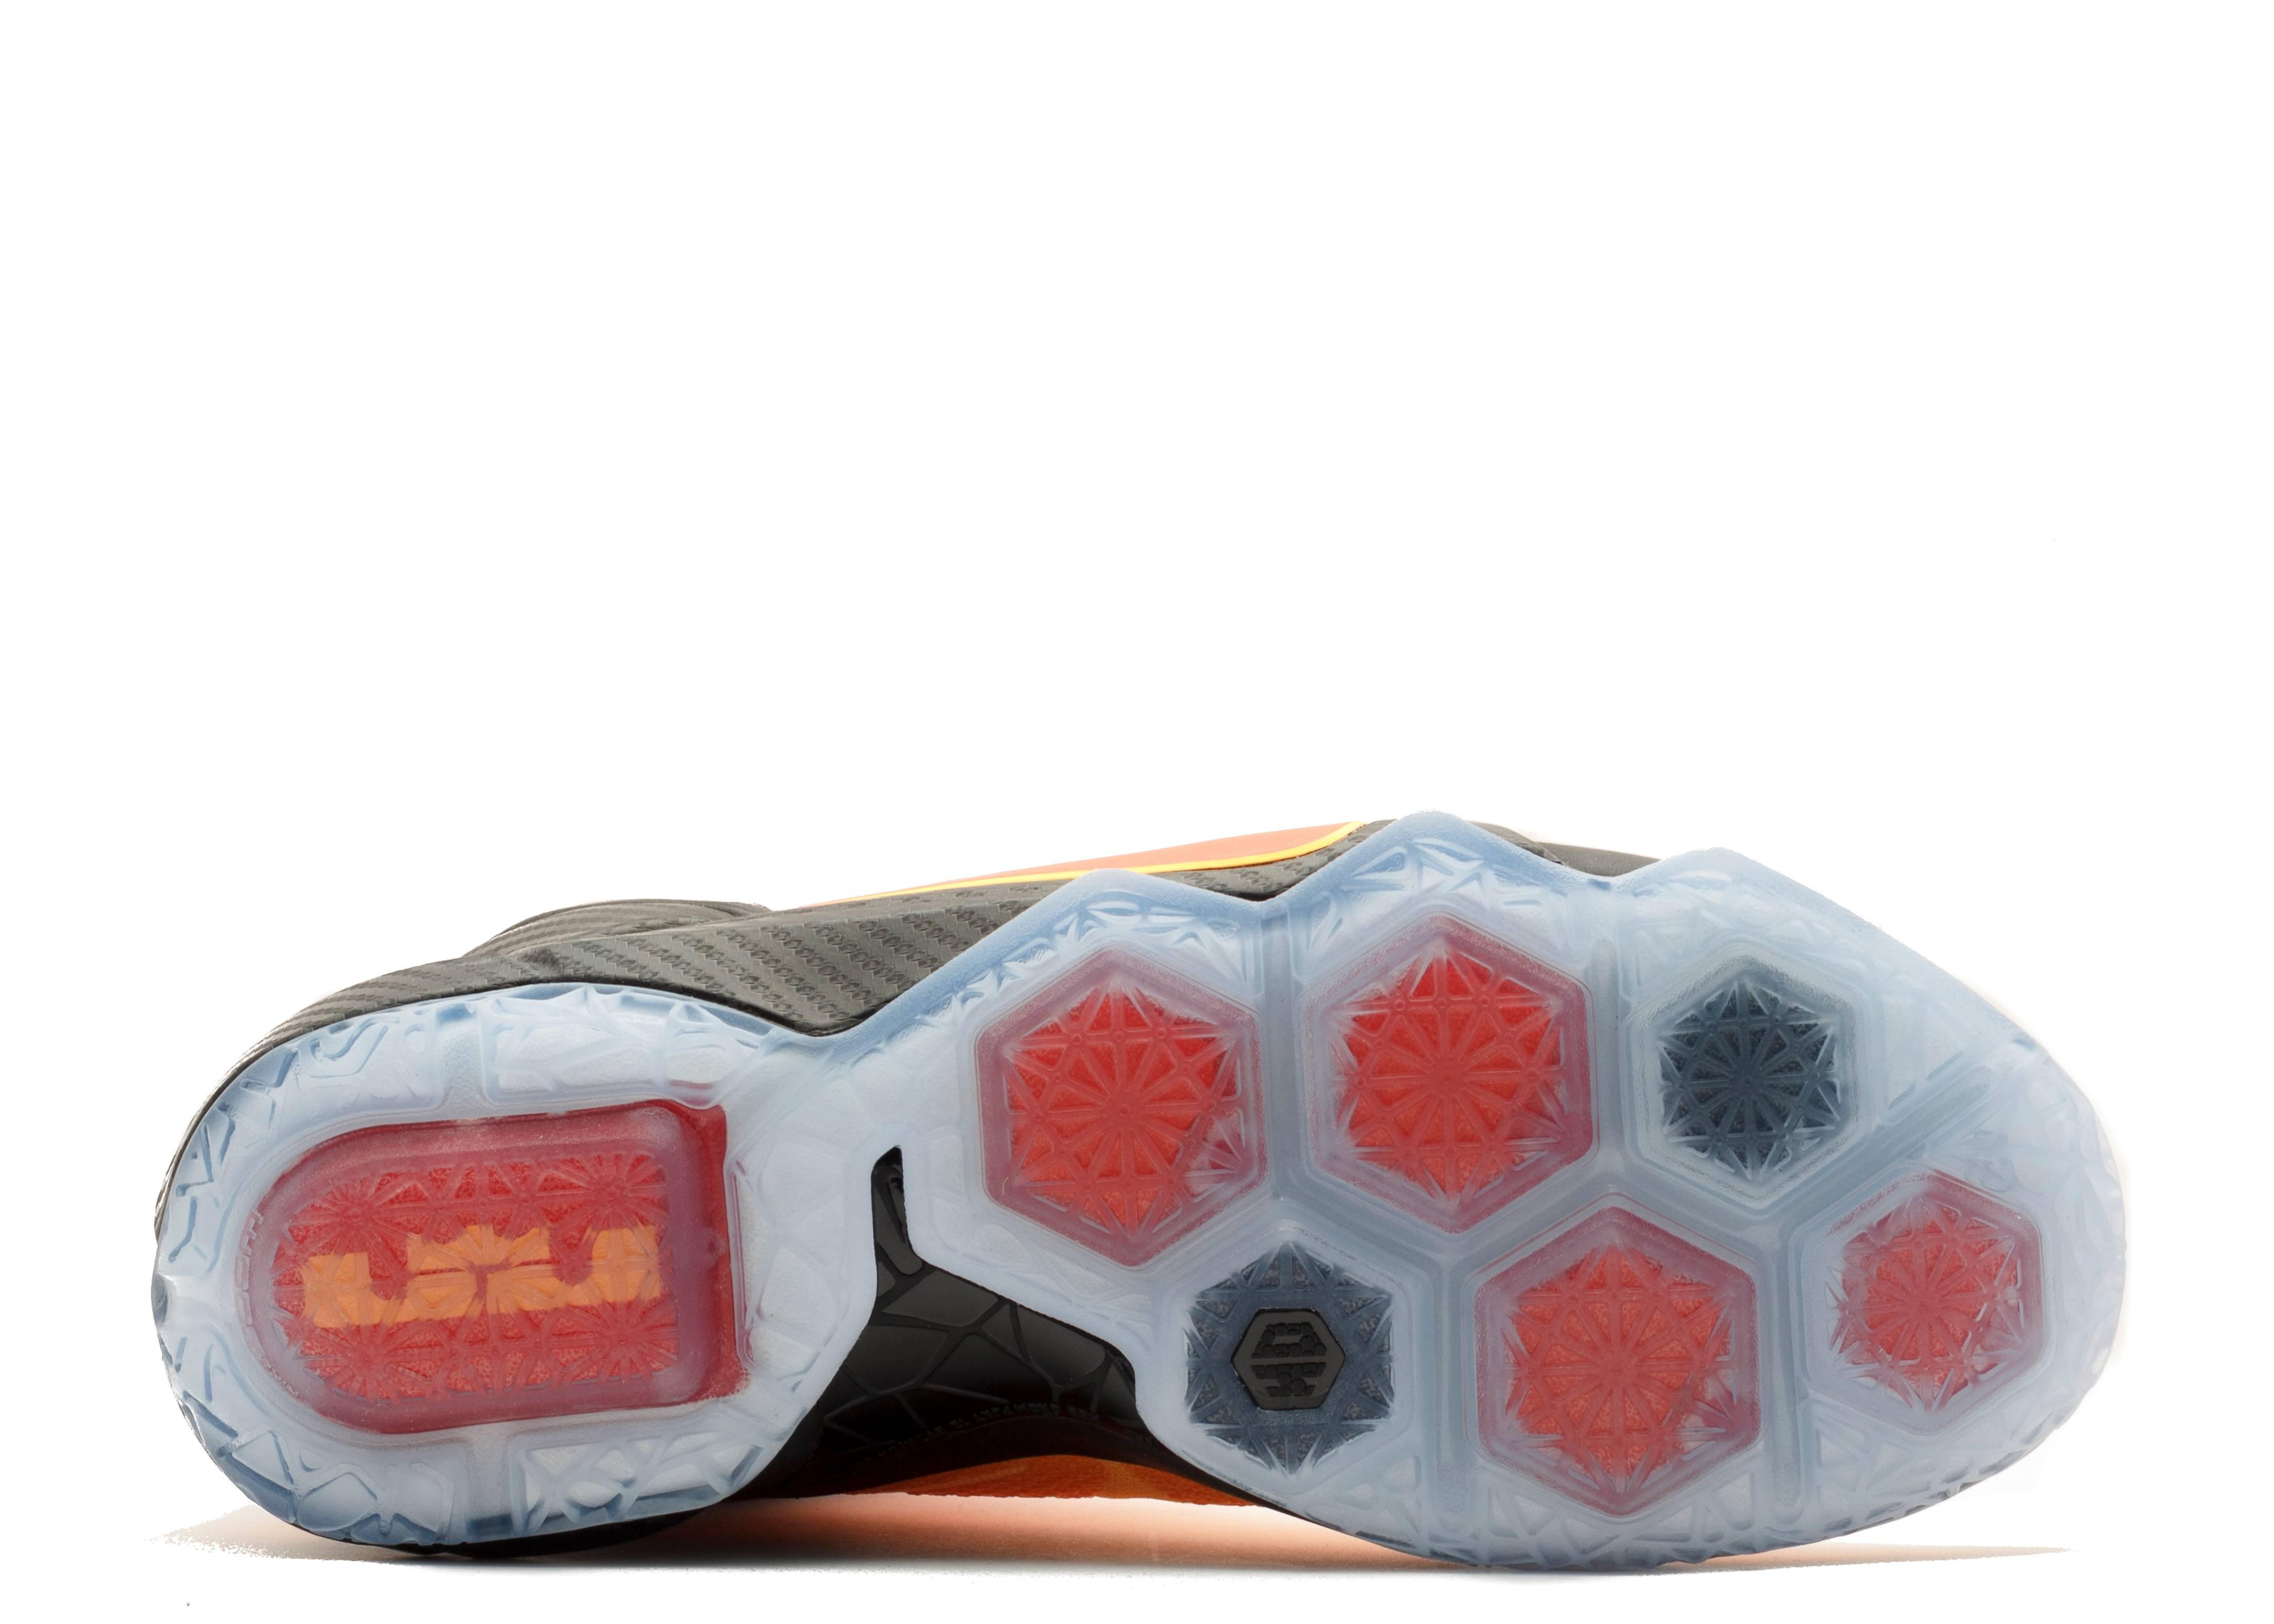 lebron 12 nike 684593 830 laser orange bright crimson flight